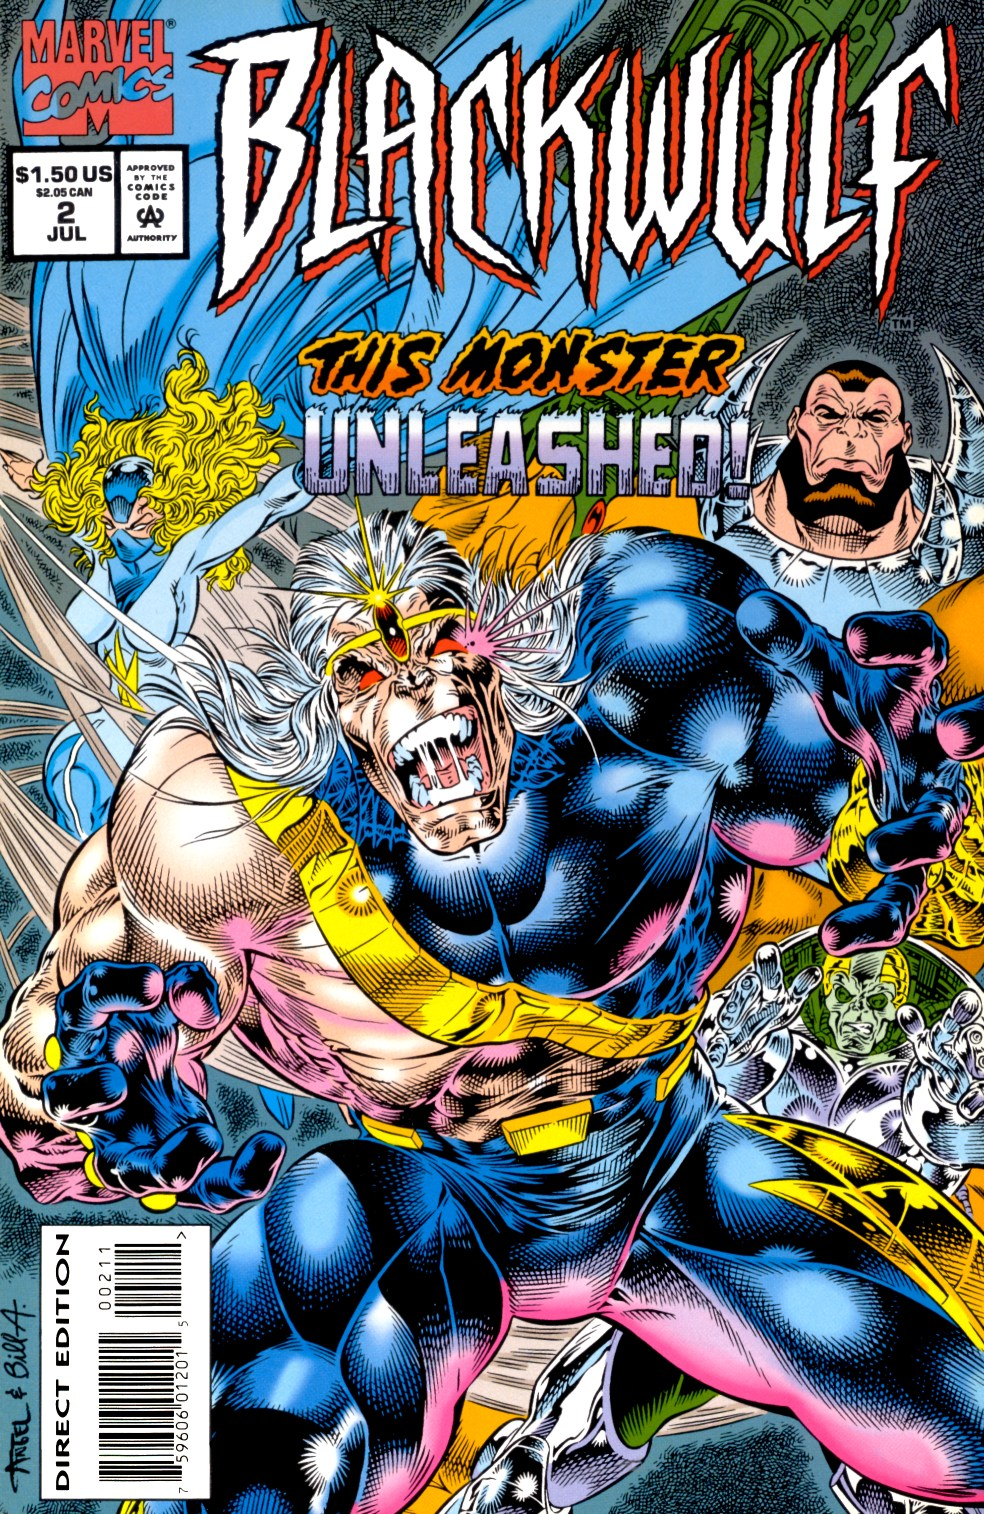 Read online Blackwulf comic -  Issue #2 - 1